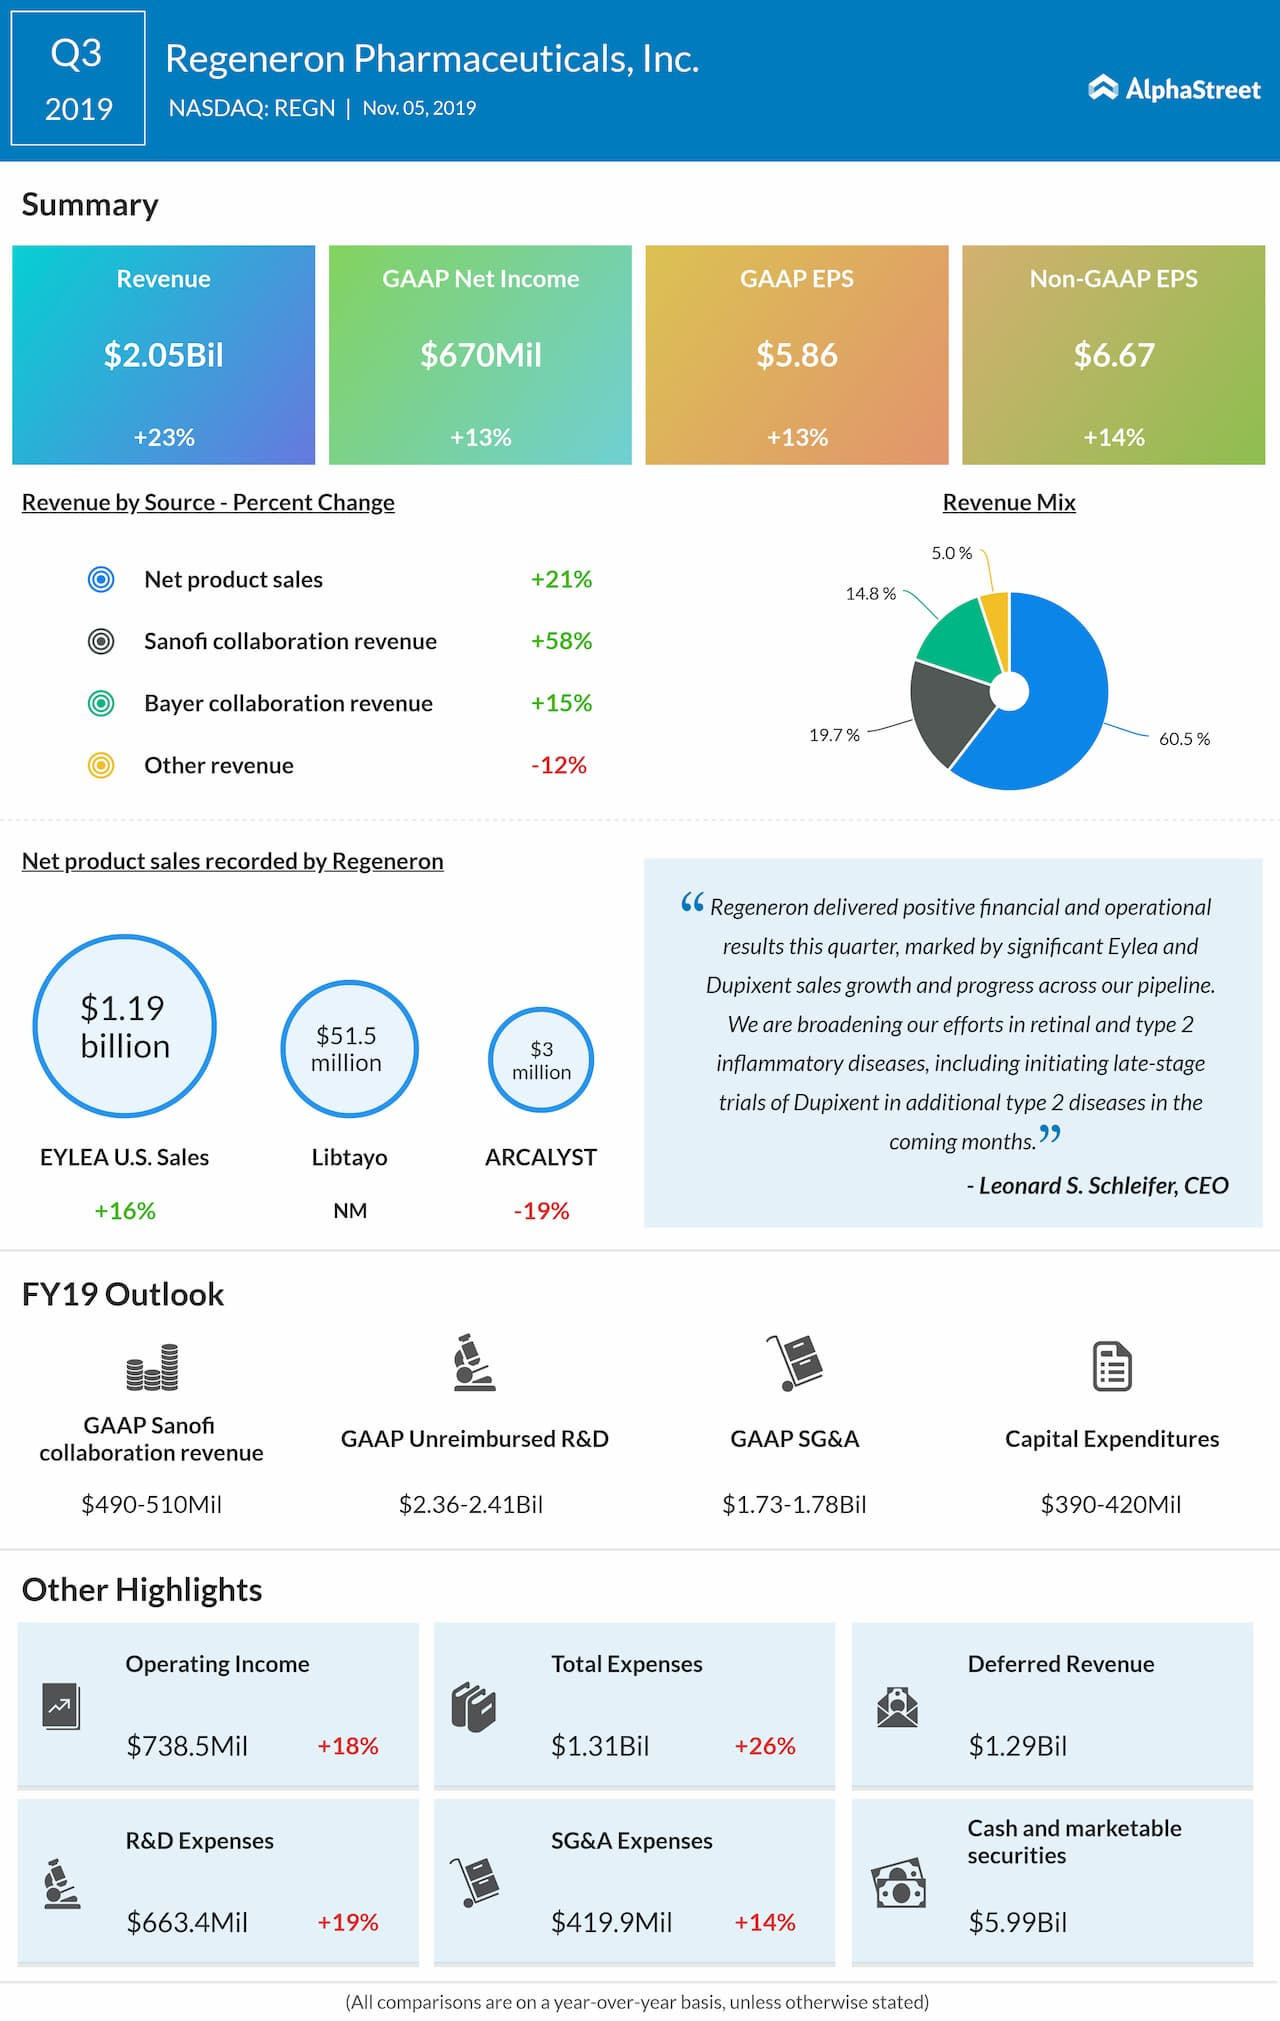 Regeneron Pharmaceuticals (REGN) Q3 2019 Earnings Review